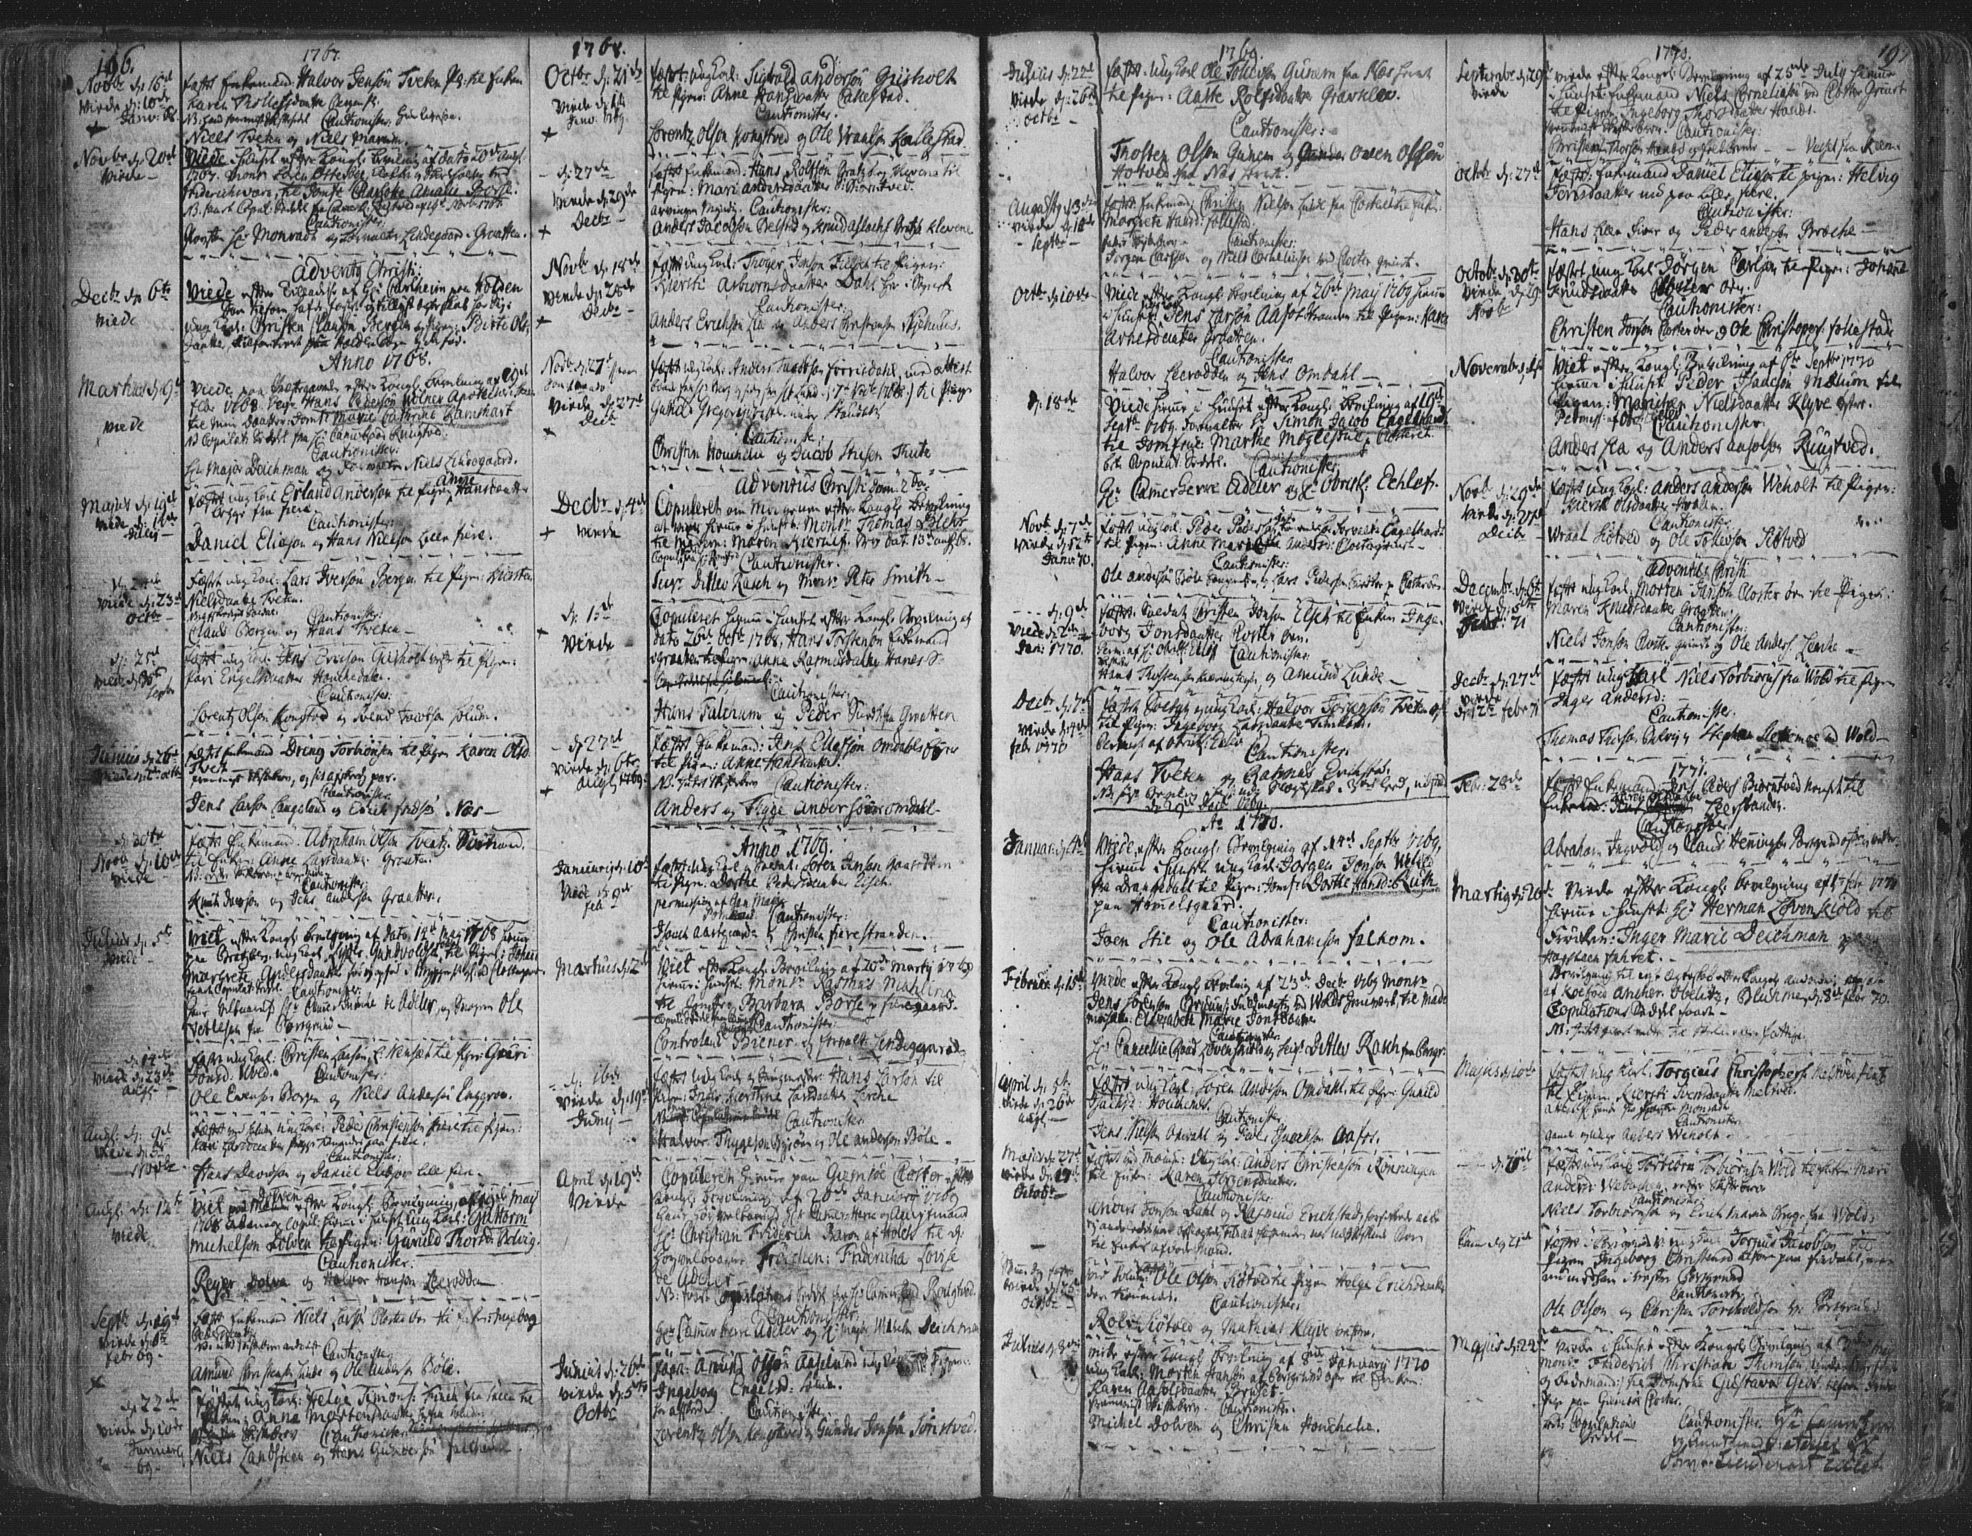 SAKO, Solum kirkebøker, F/Fa/L0003: Ministerialbok nr. I 3, 1761-1814, s. 196-197